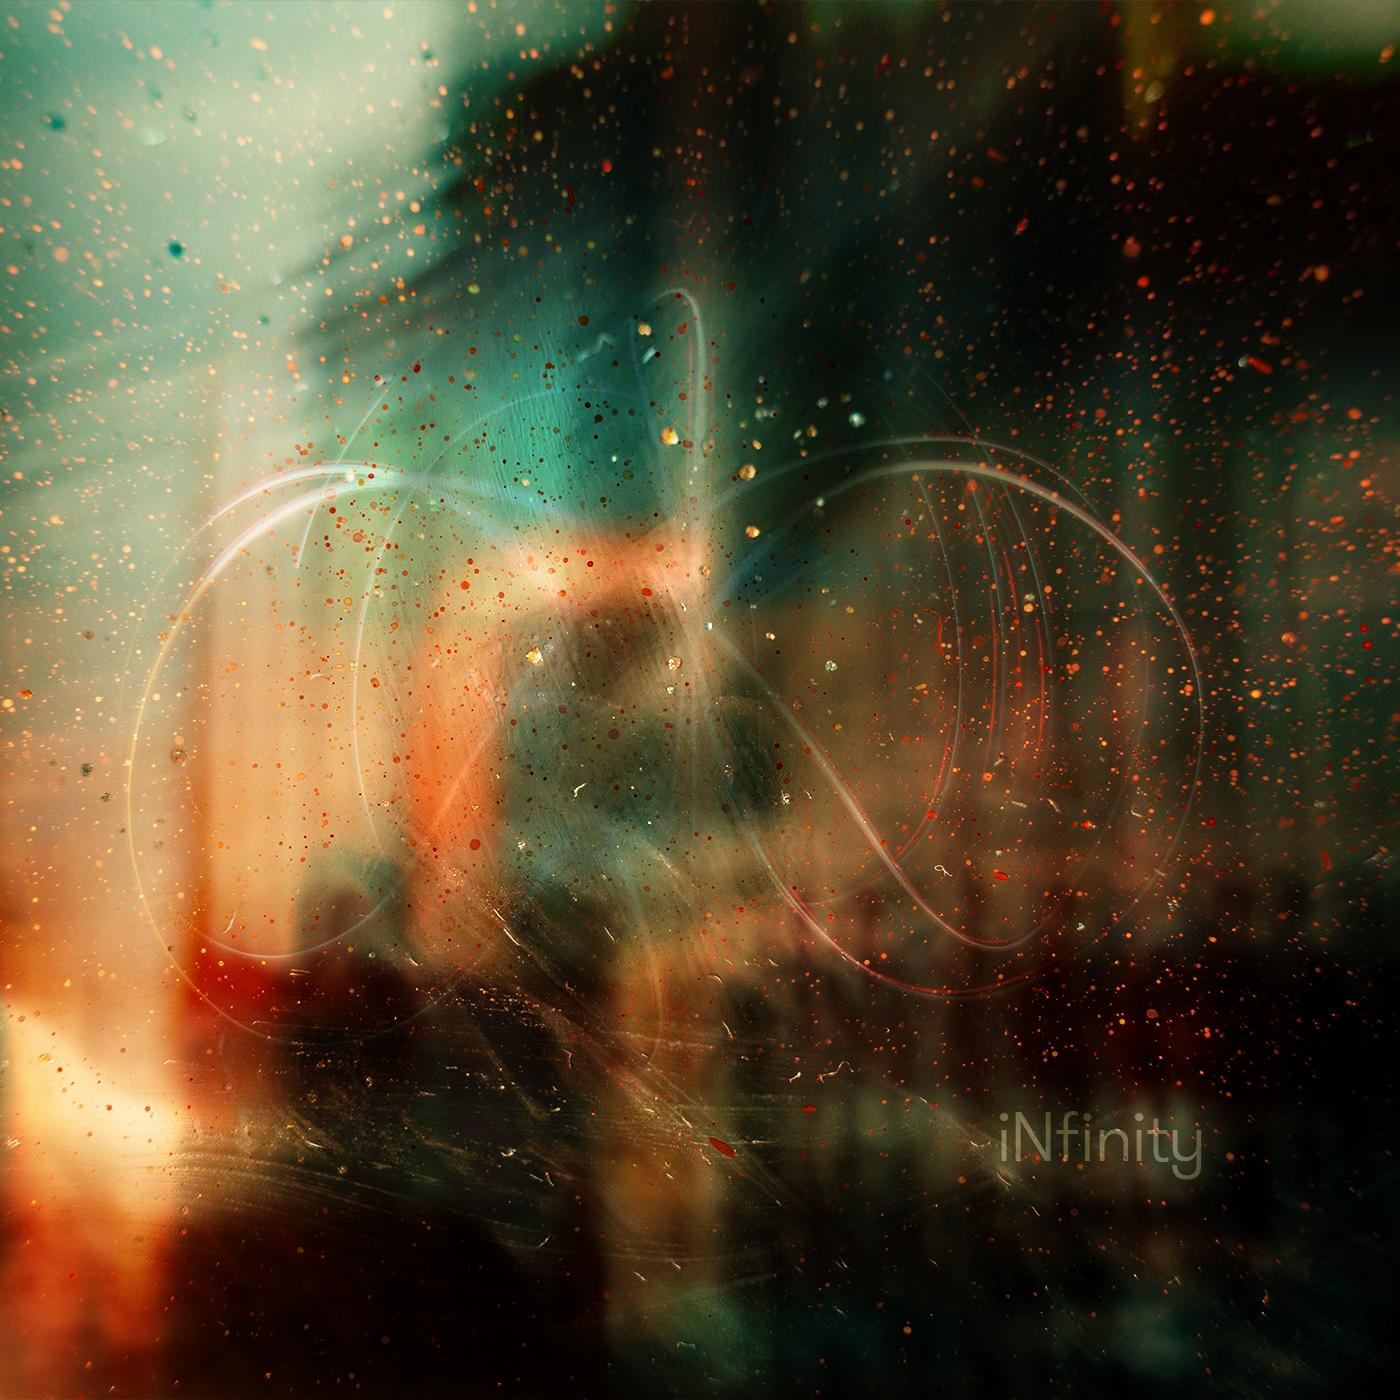 iNfinity album artwork